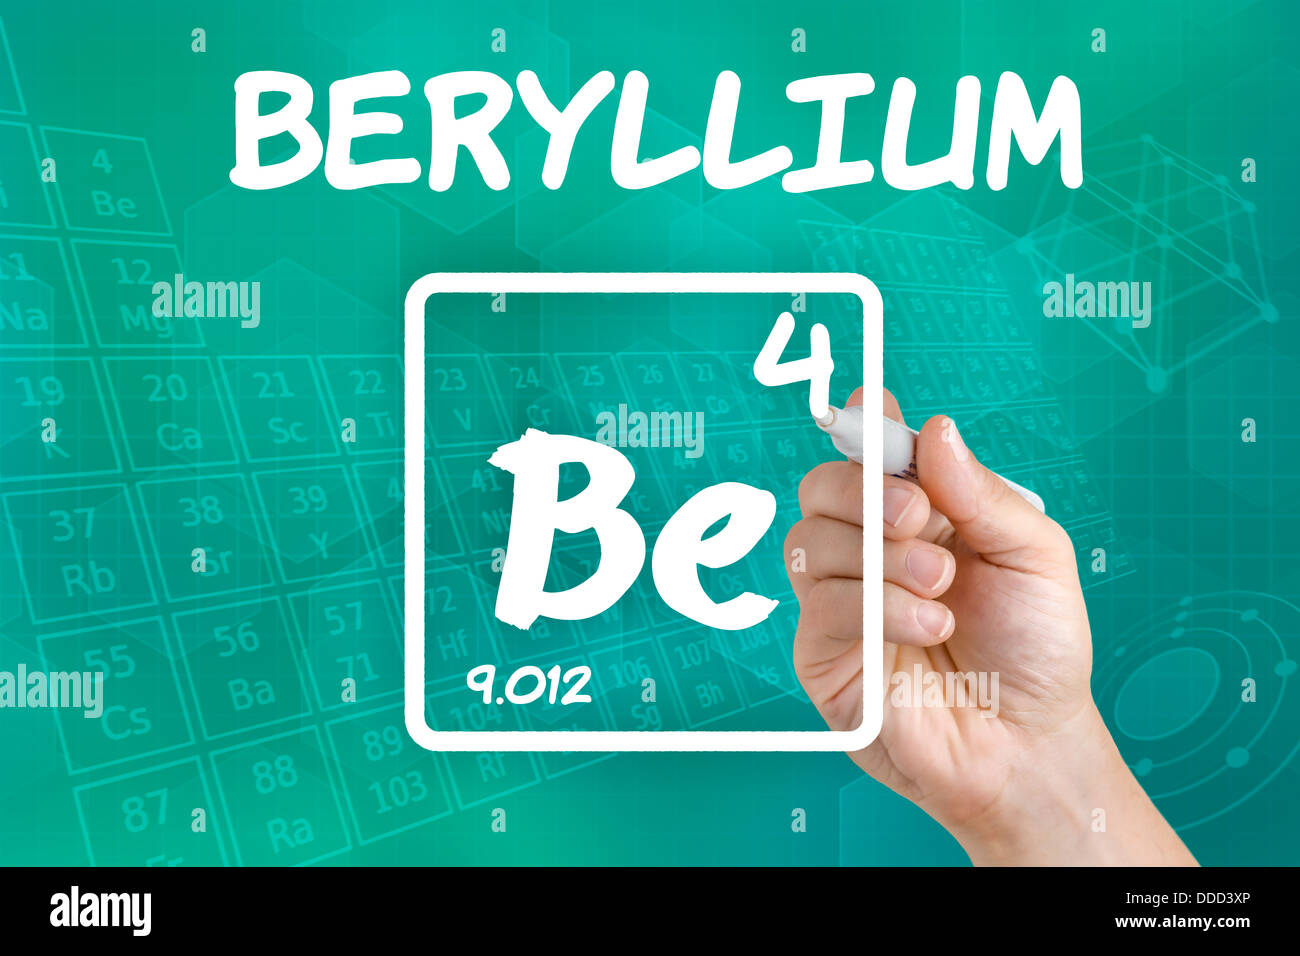 Symbol For The Chemical Element Beryllium Stock Photo 59910110 Alamy